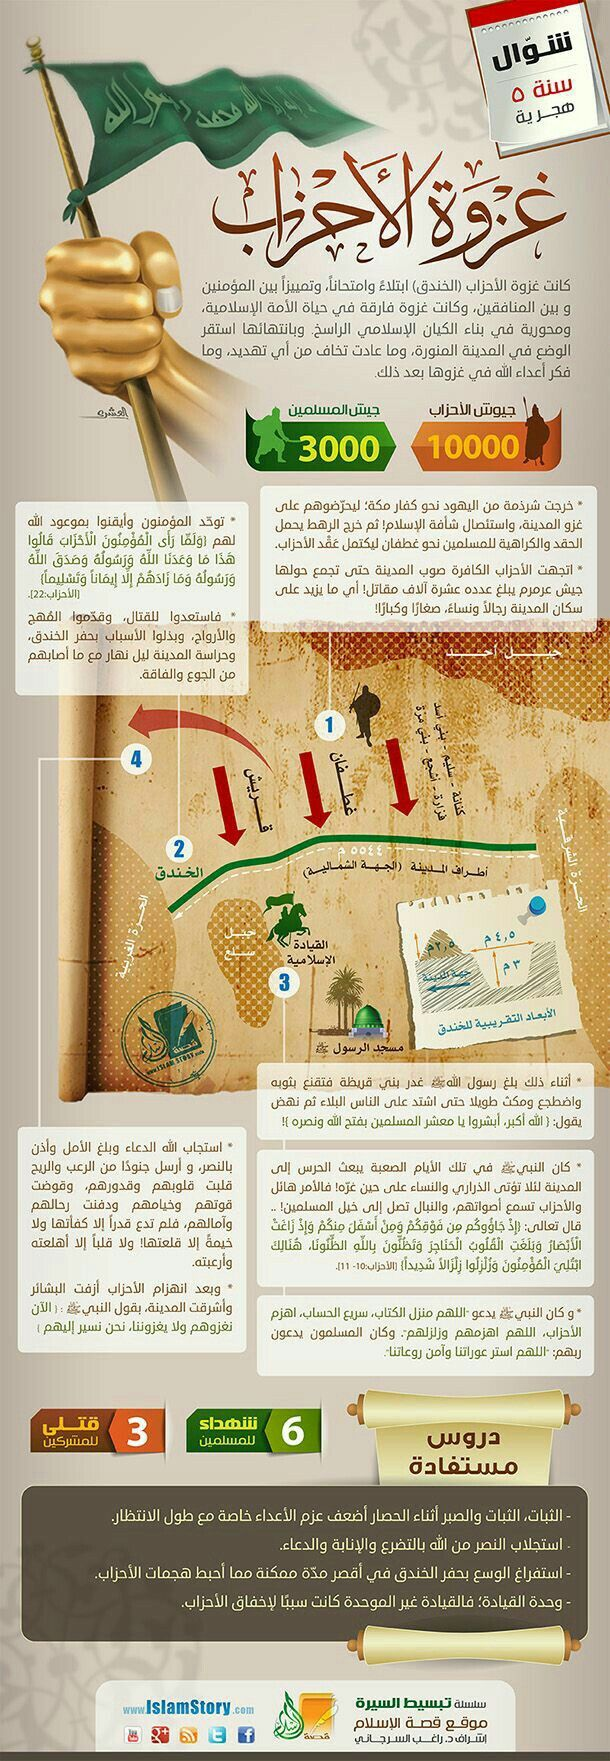 Pin By Medhatekl7abashy El7abashy On انفوجرافيك غزوات وفتوحات وتاريخ Islam Facts Islam Beliefs Learn Islam